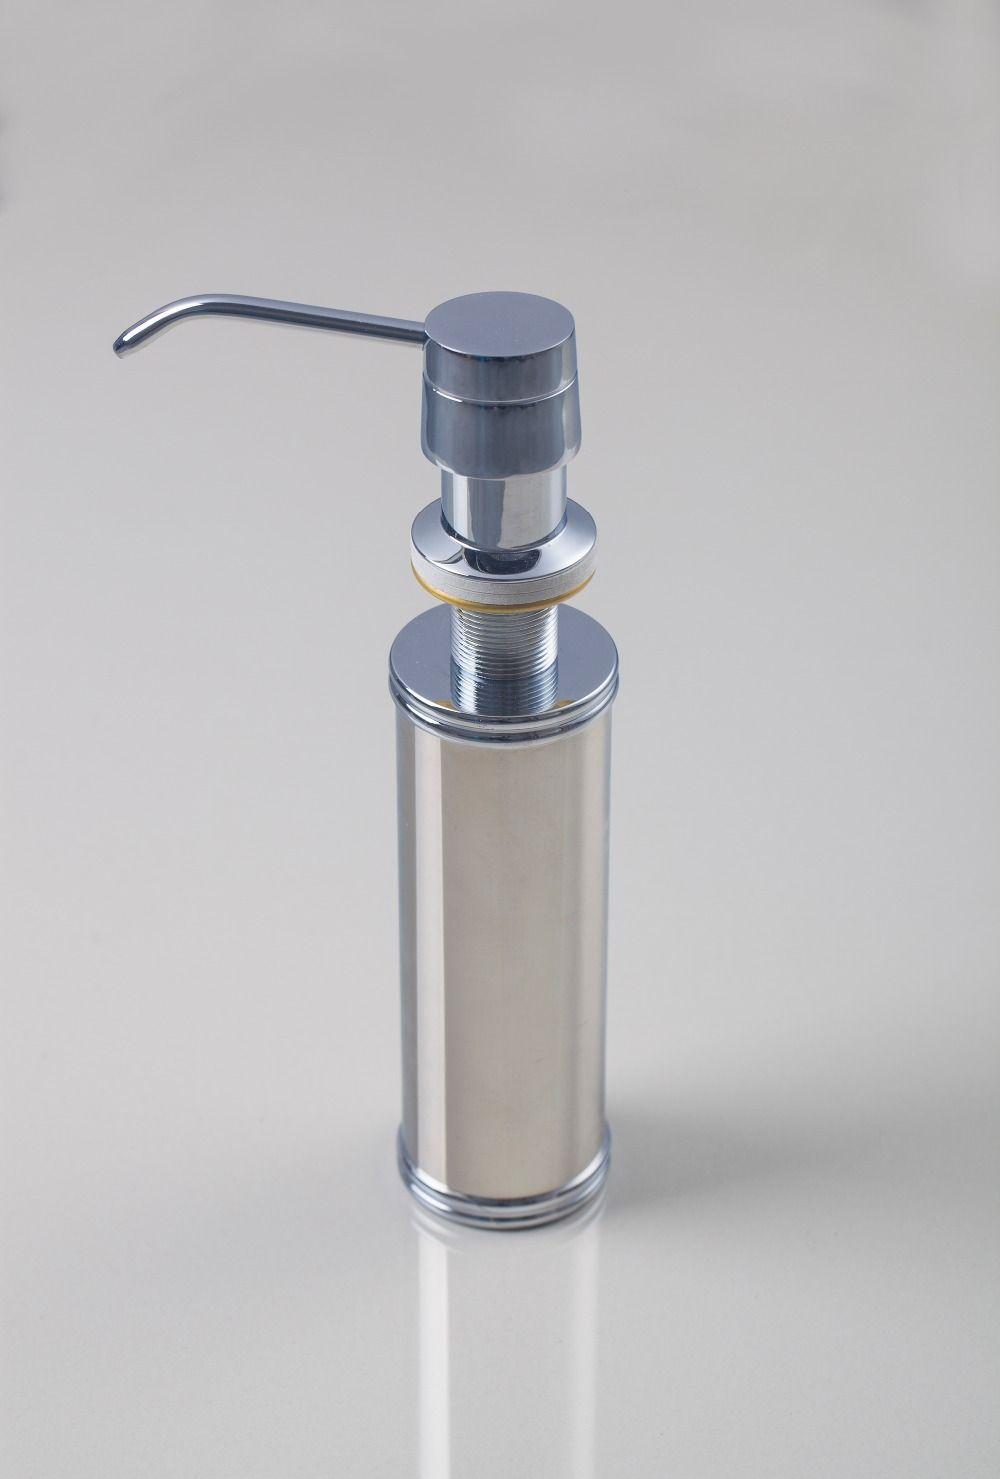 E Pak Hello Bathroom Kitchen Liquid Soap Dispensers Stainless